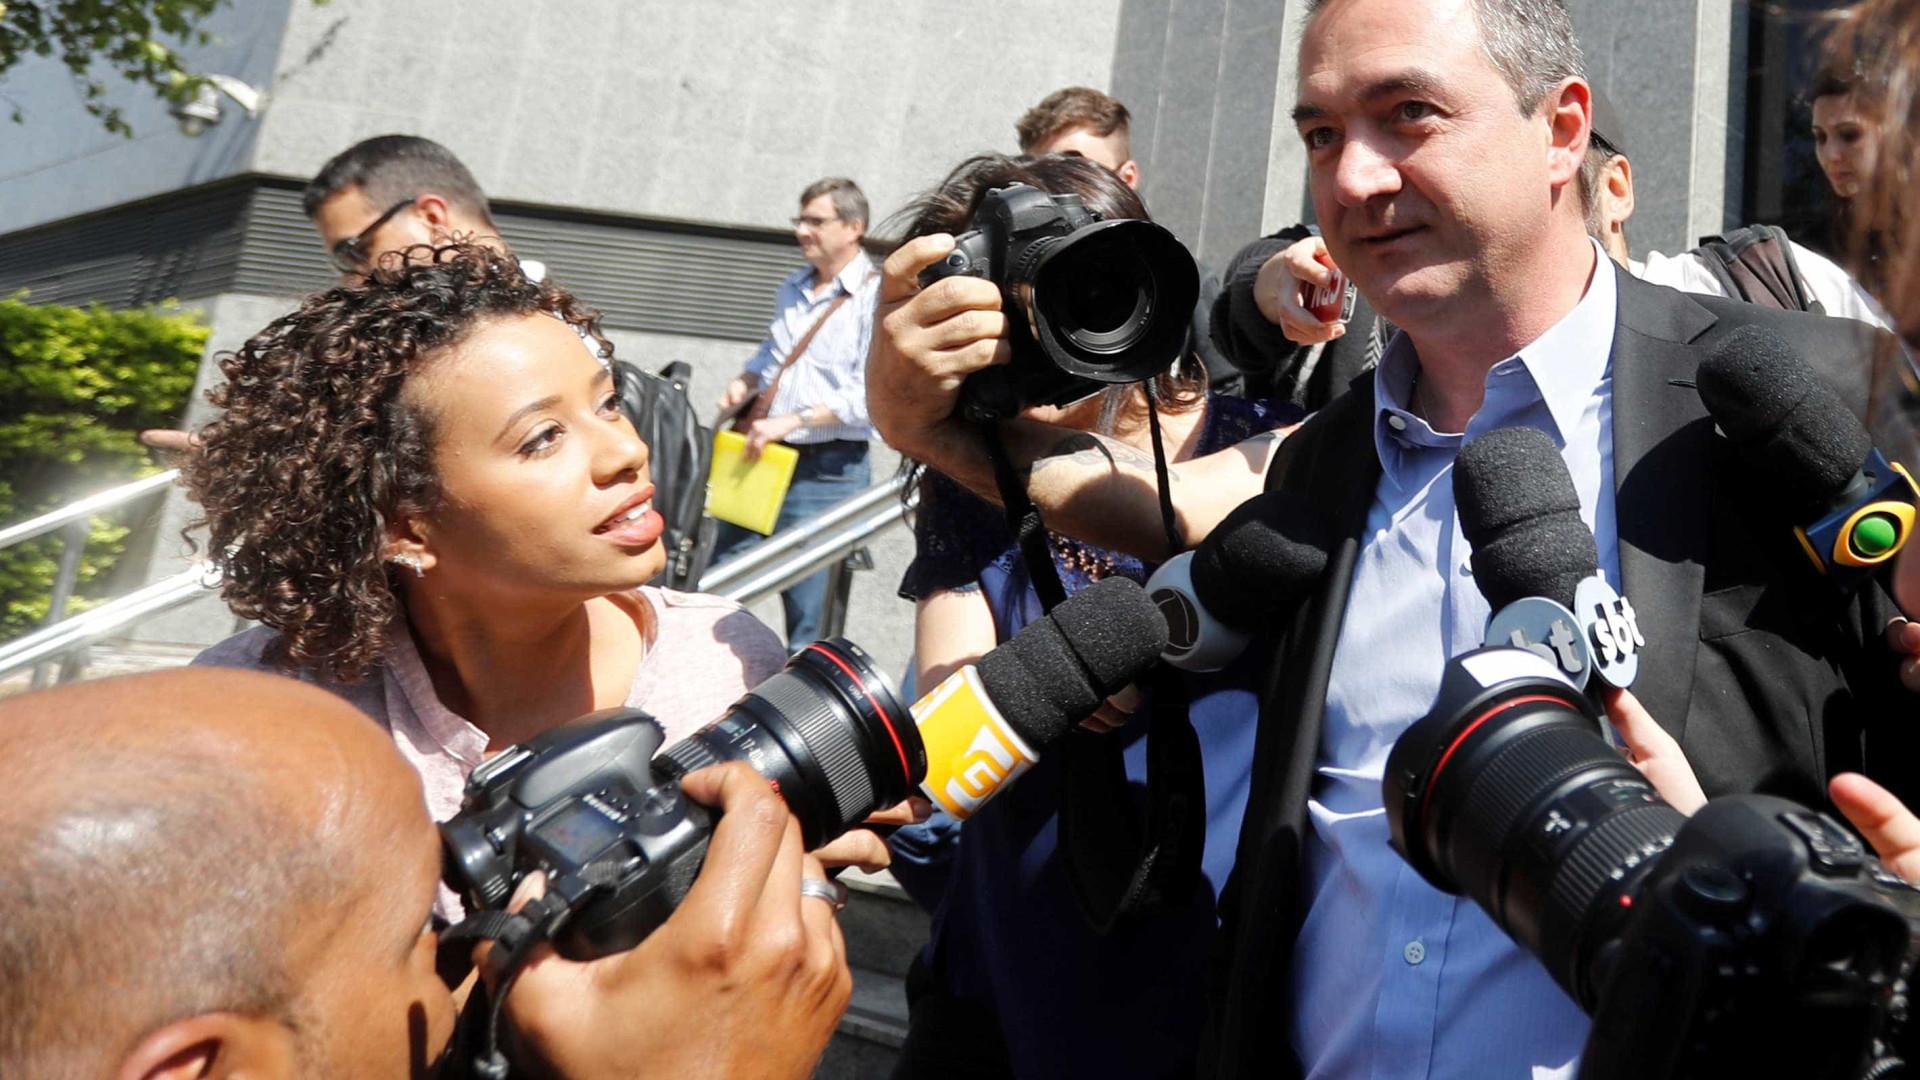 Joesley entrega passaporte à Justiça Federal